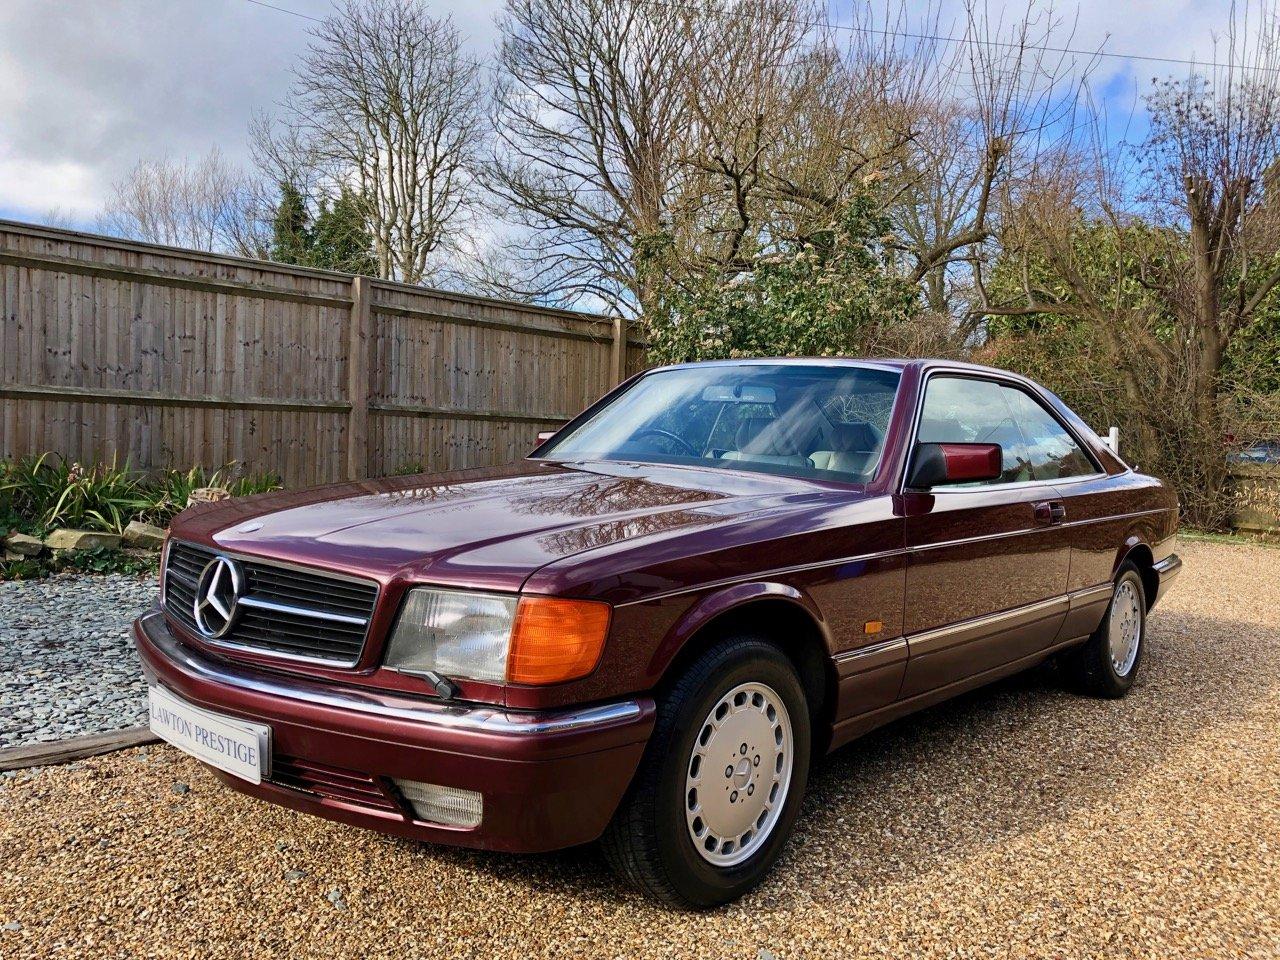 1988- Mercedes 420SEC C126 *SOLD-MORE REQD* 560SEC 500 SEC For Sale (picture 1 of 6)